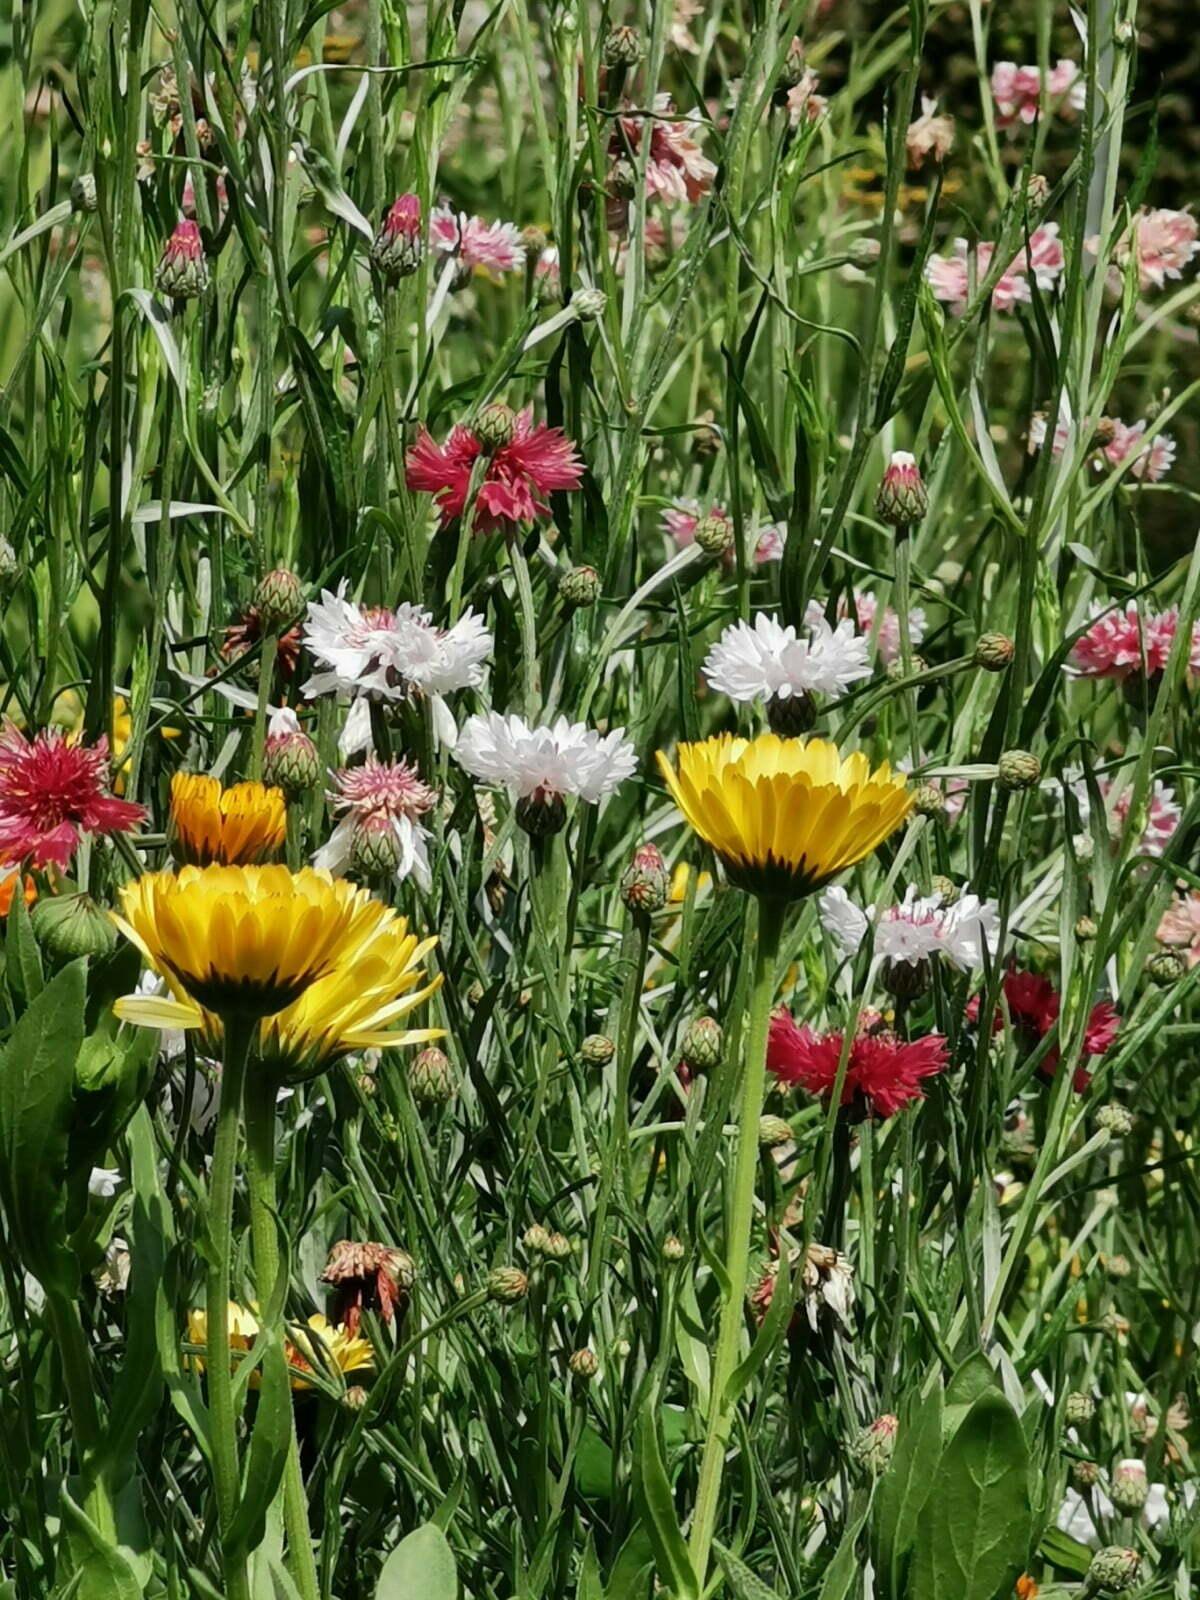 Bateman's Garden: A Kaleidoscope of Colours at Rudyard Kipling's National Trust Home 6